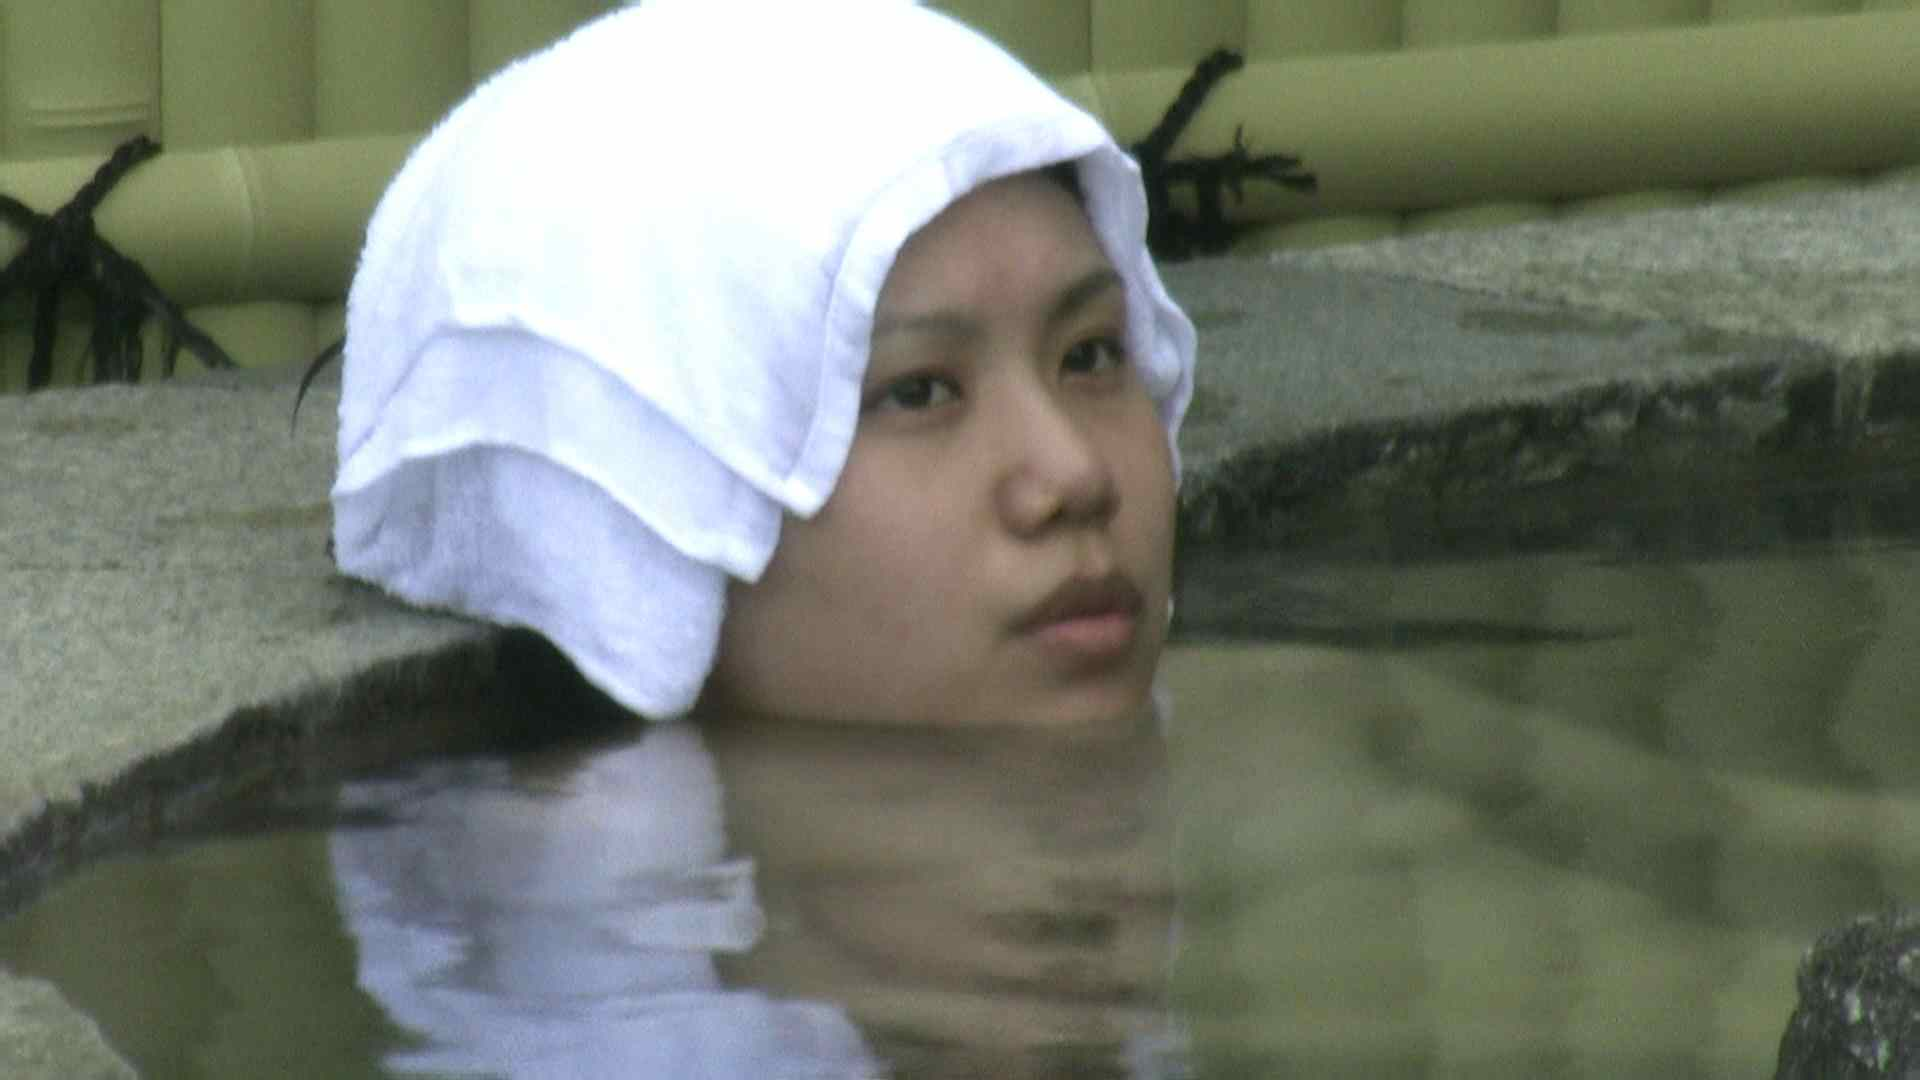 Aquaな露天風呂Vol.669 盗撮特撮  10pic 6